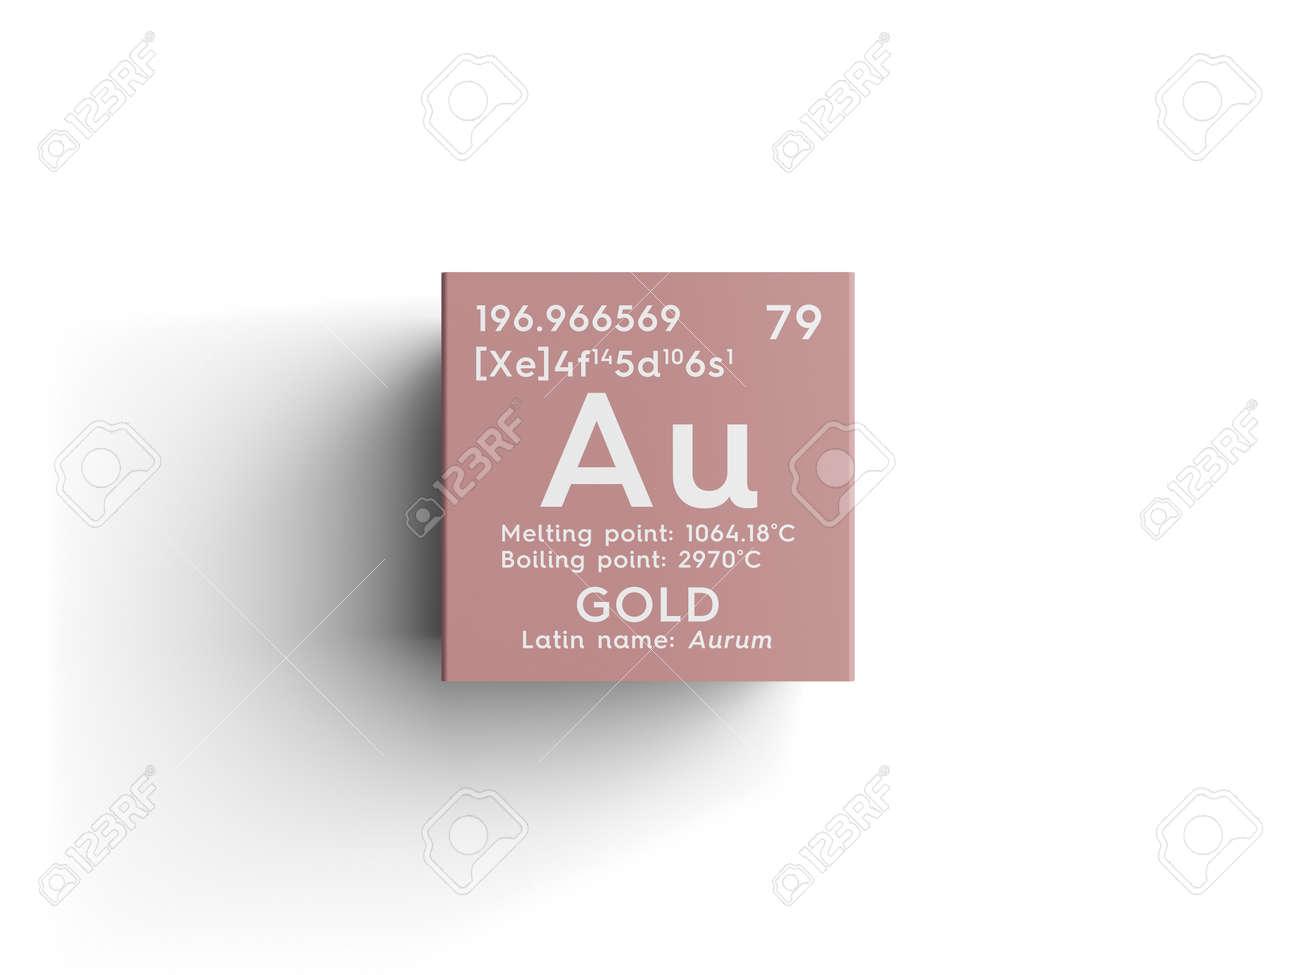 Gold aurum transition metals chemical element of mendeleevs gold aurum transition metals chemical element of mendeleevs periodic table gold in urtaz Images